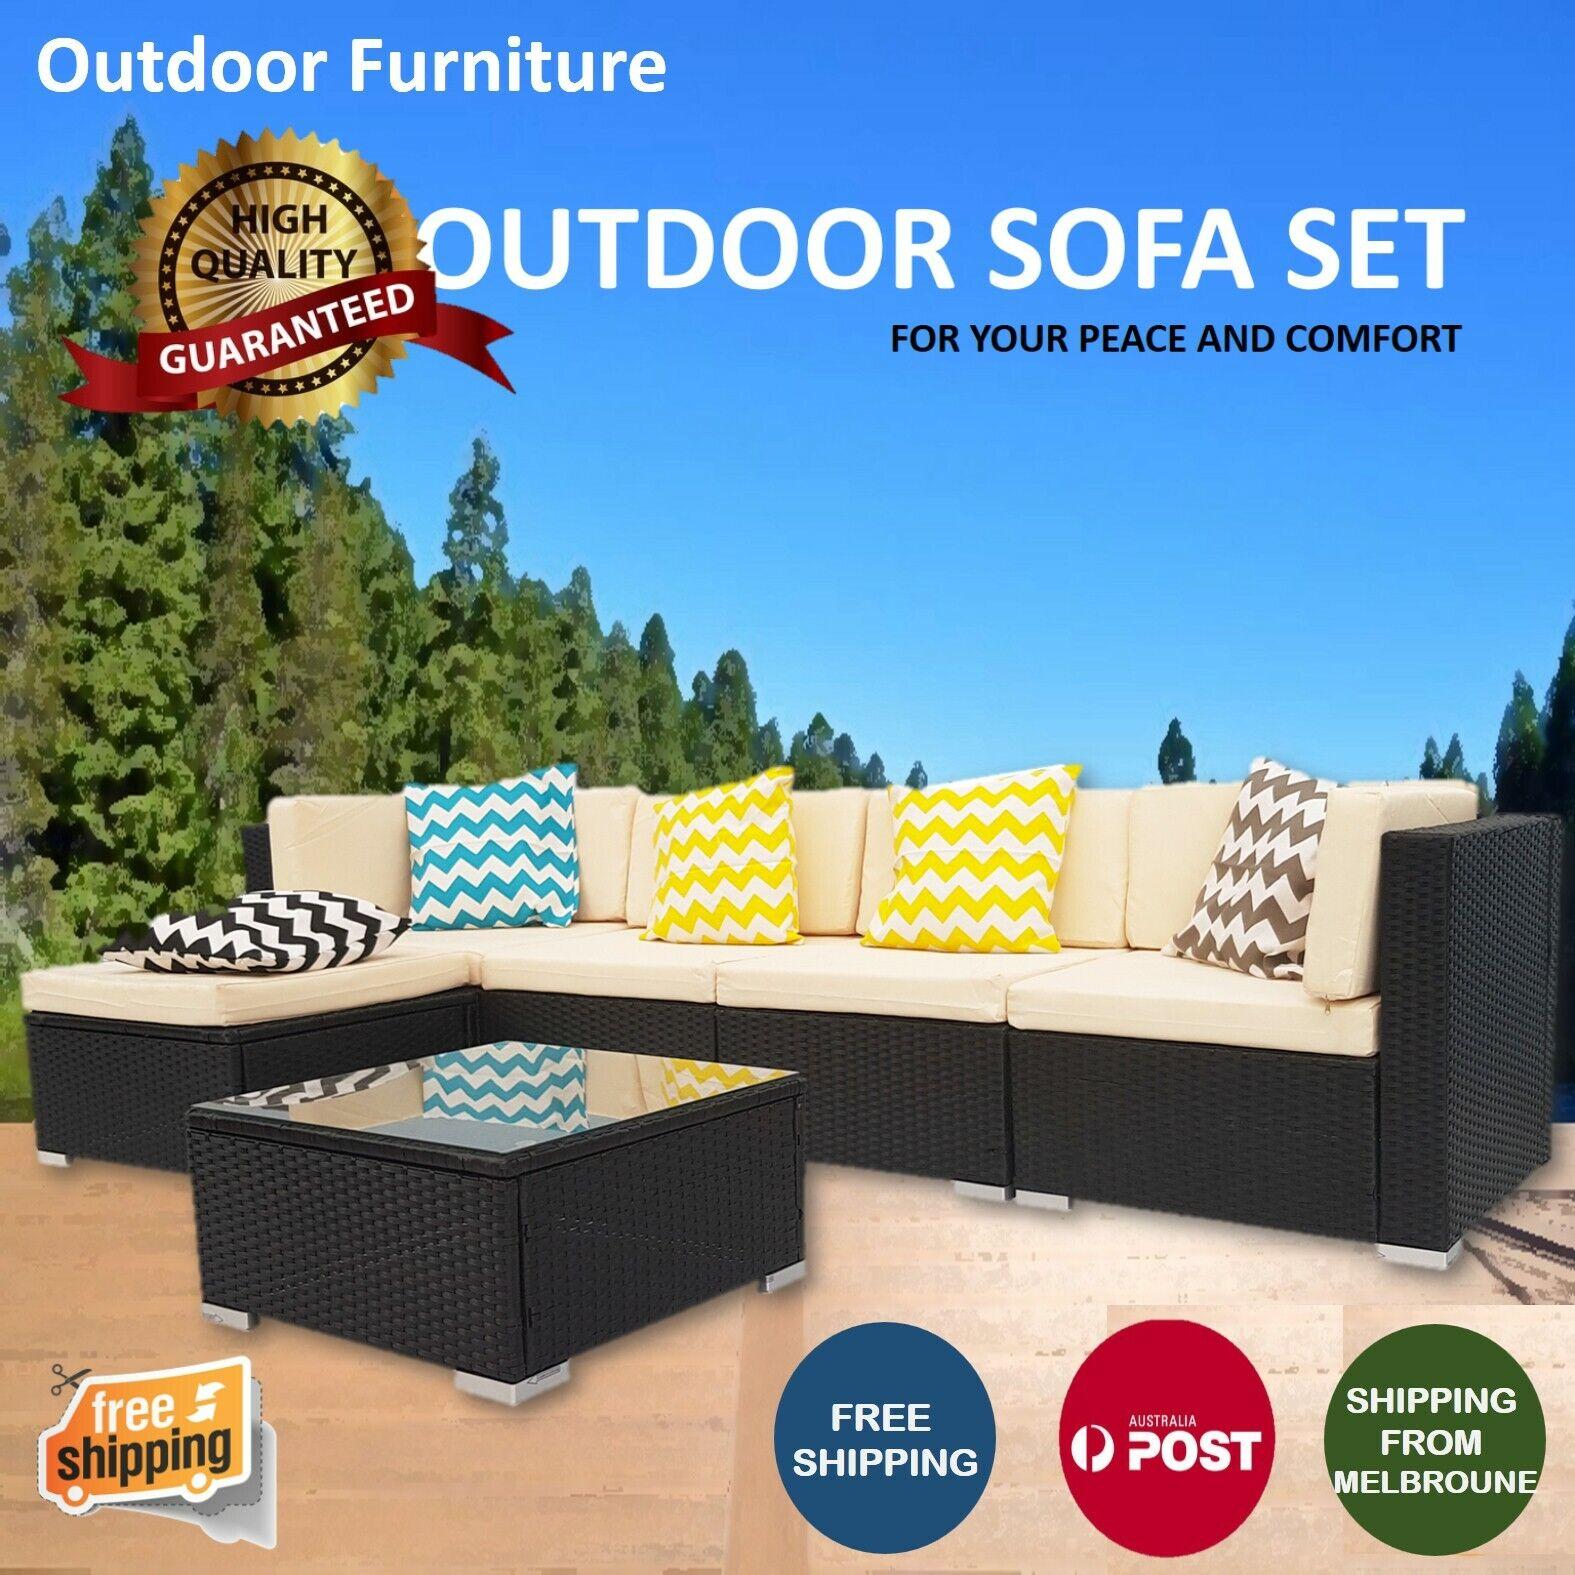 Garden Furniture - Outdoor Furniture Rattan Sofa Set Wicker Lounge Garden Patio Couch Setting AU